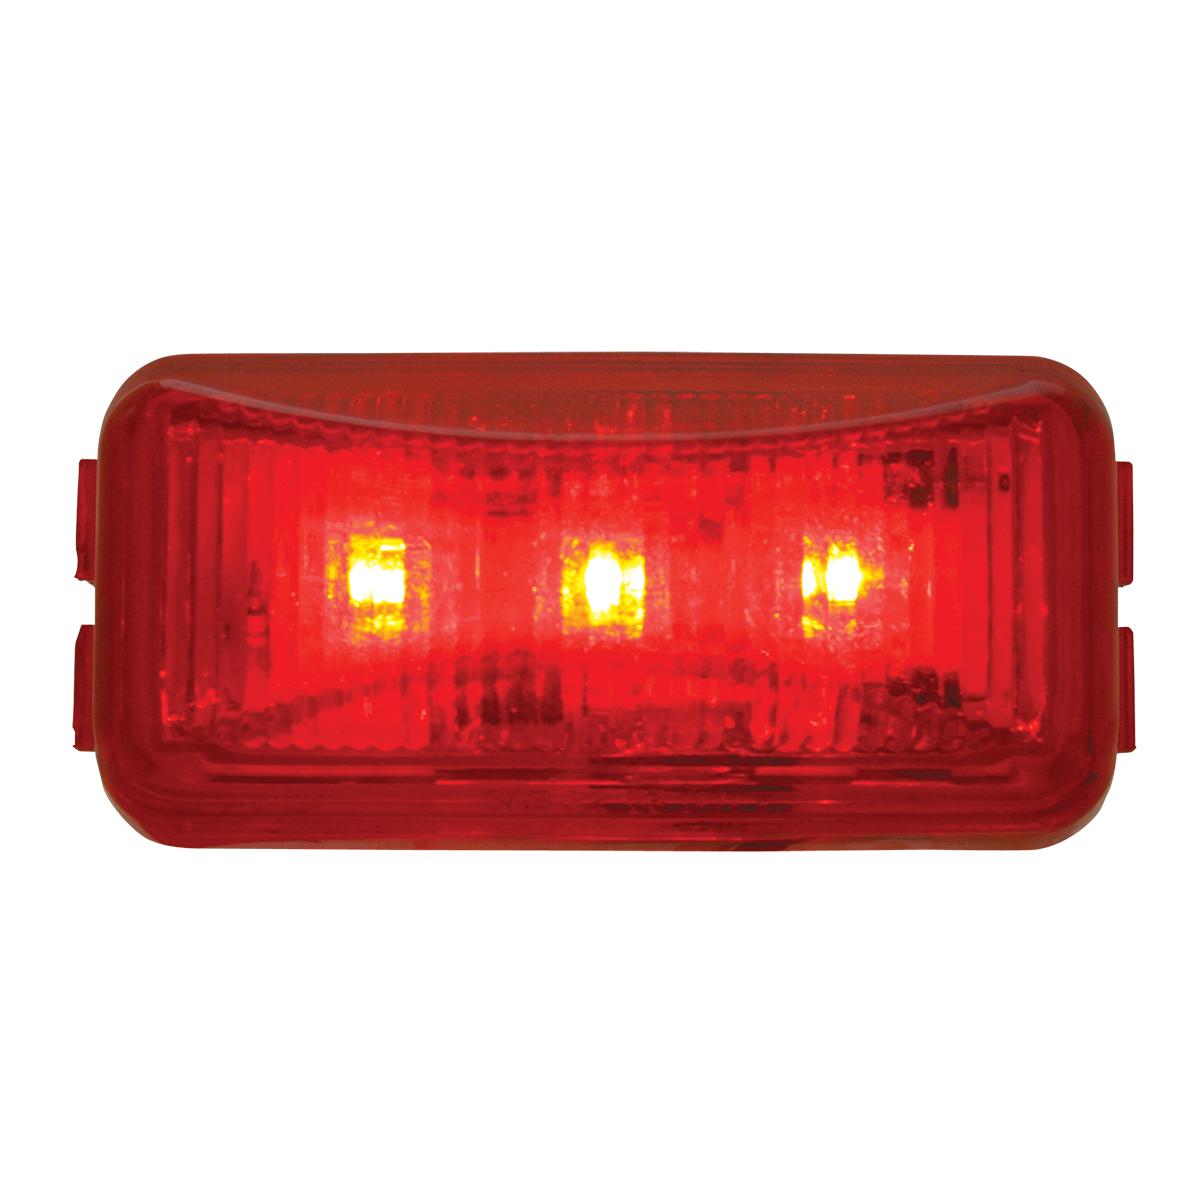 87645 Small Rectangular LED Marker Light in Red/Red